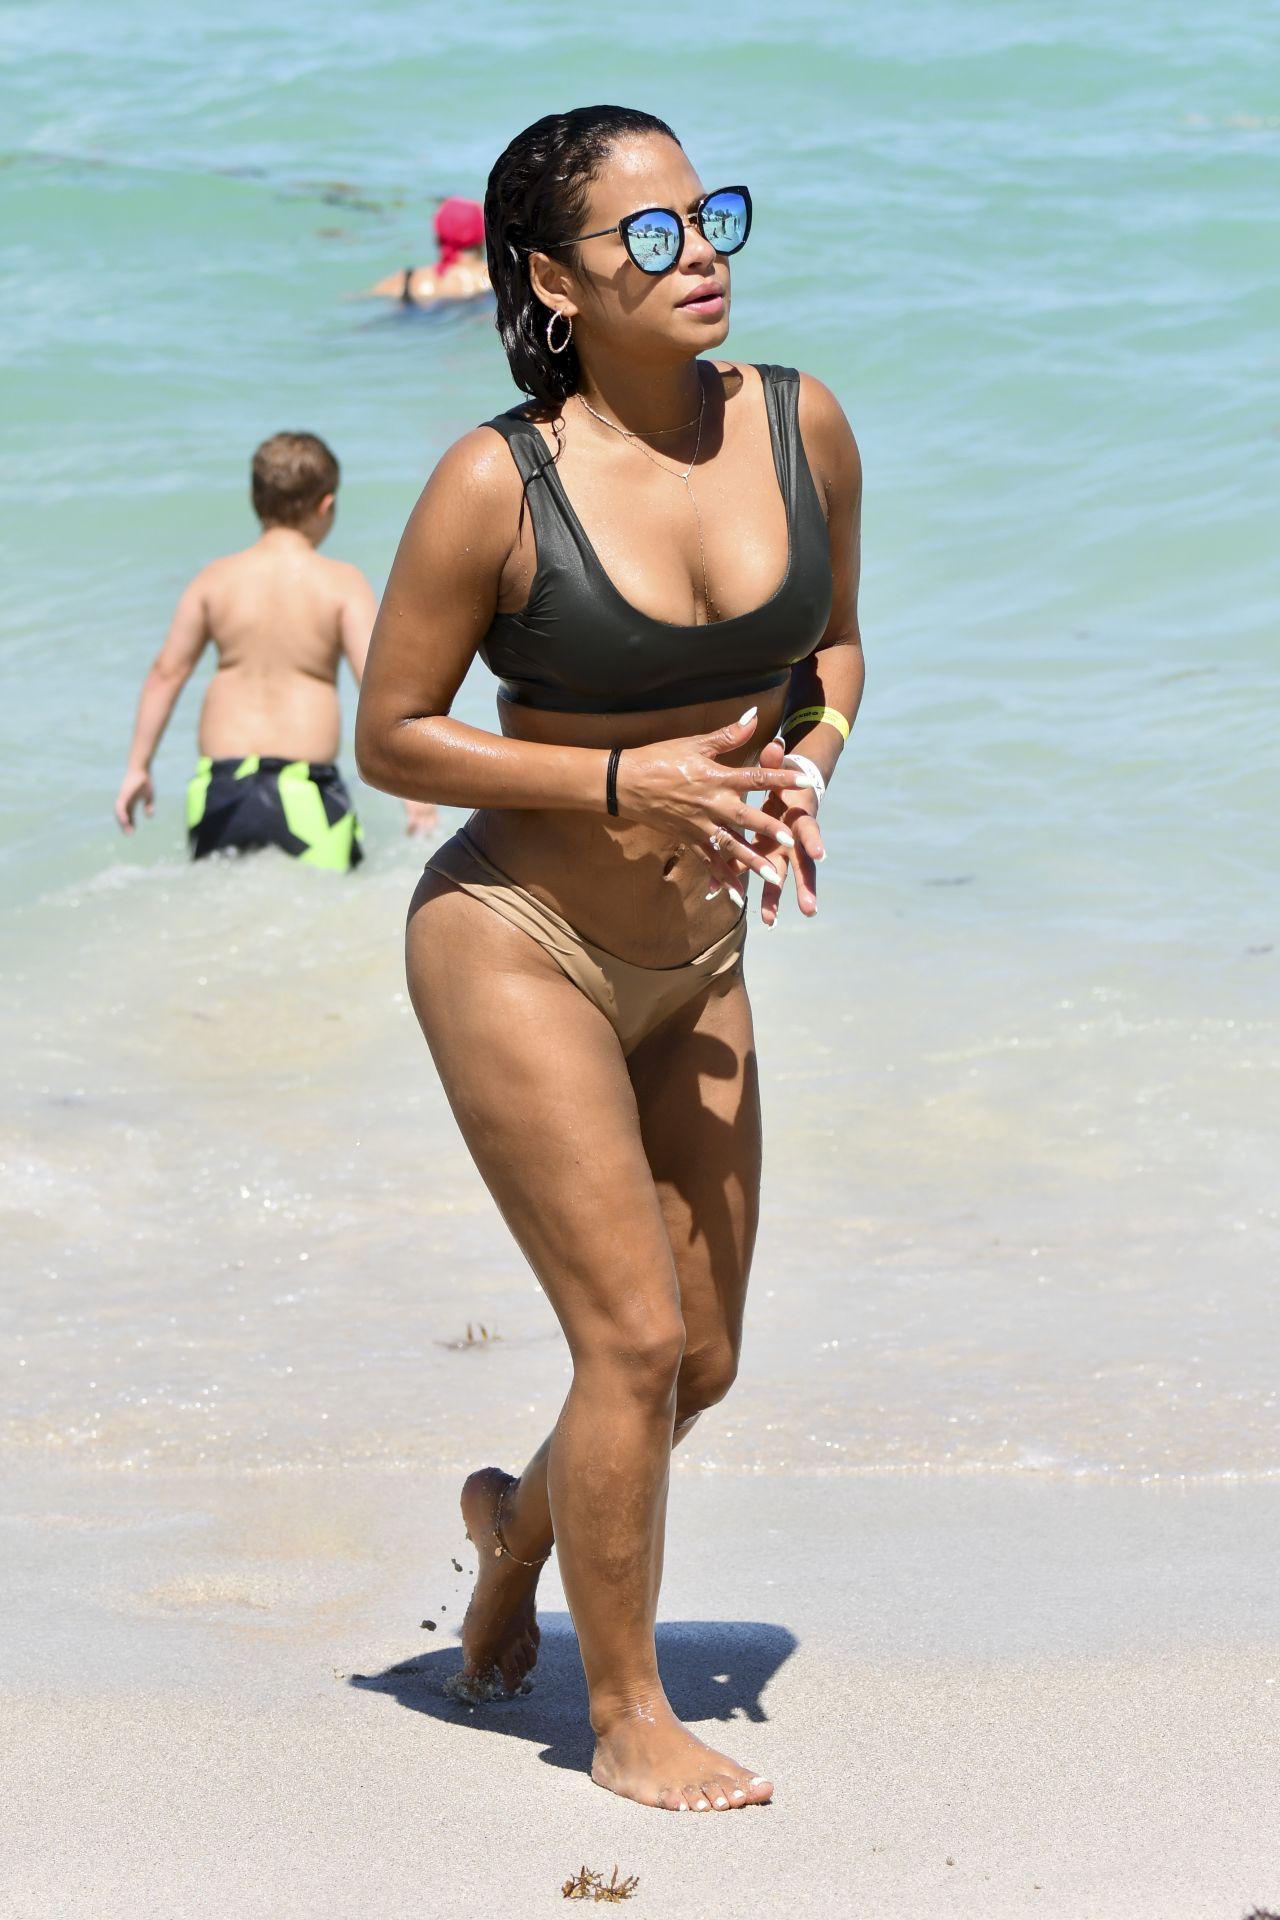 Christina milian sexy beach bikini selfie vid 9